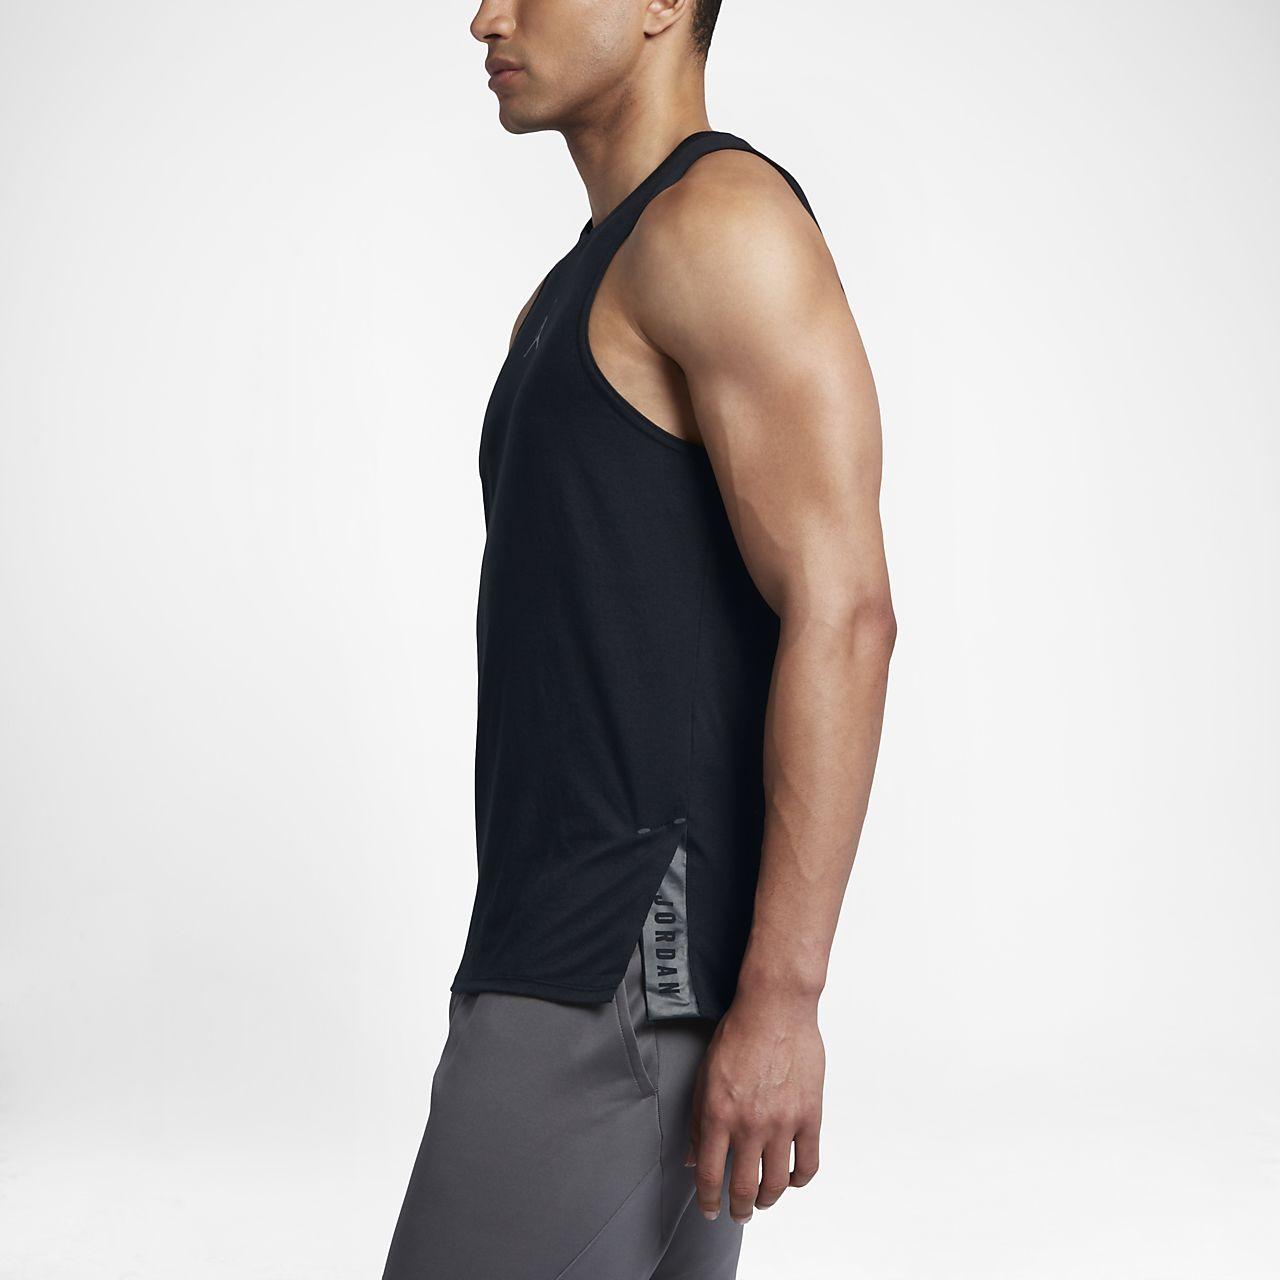 367acbbf60f0 Jordan 23 Tech Cool Men s Training Tank. Nike.com ID